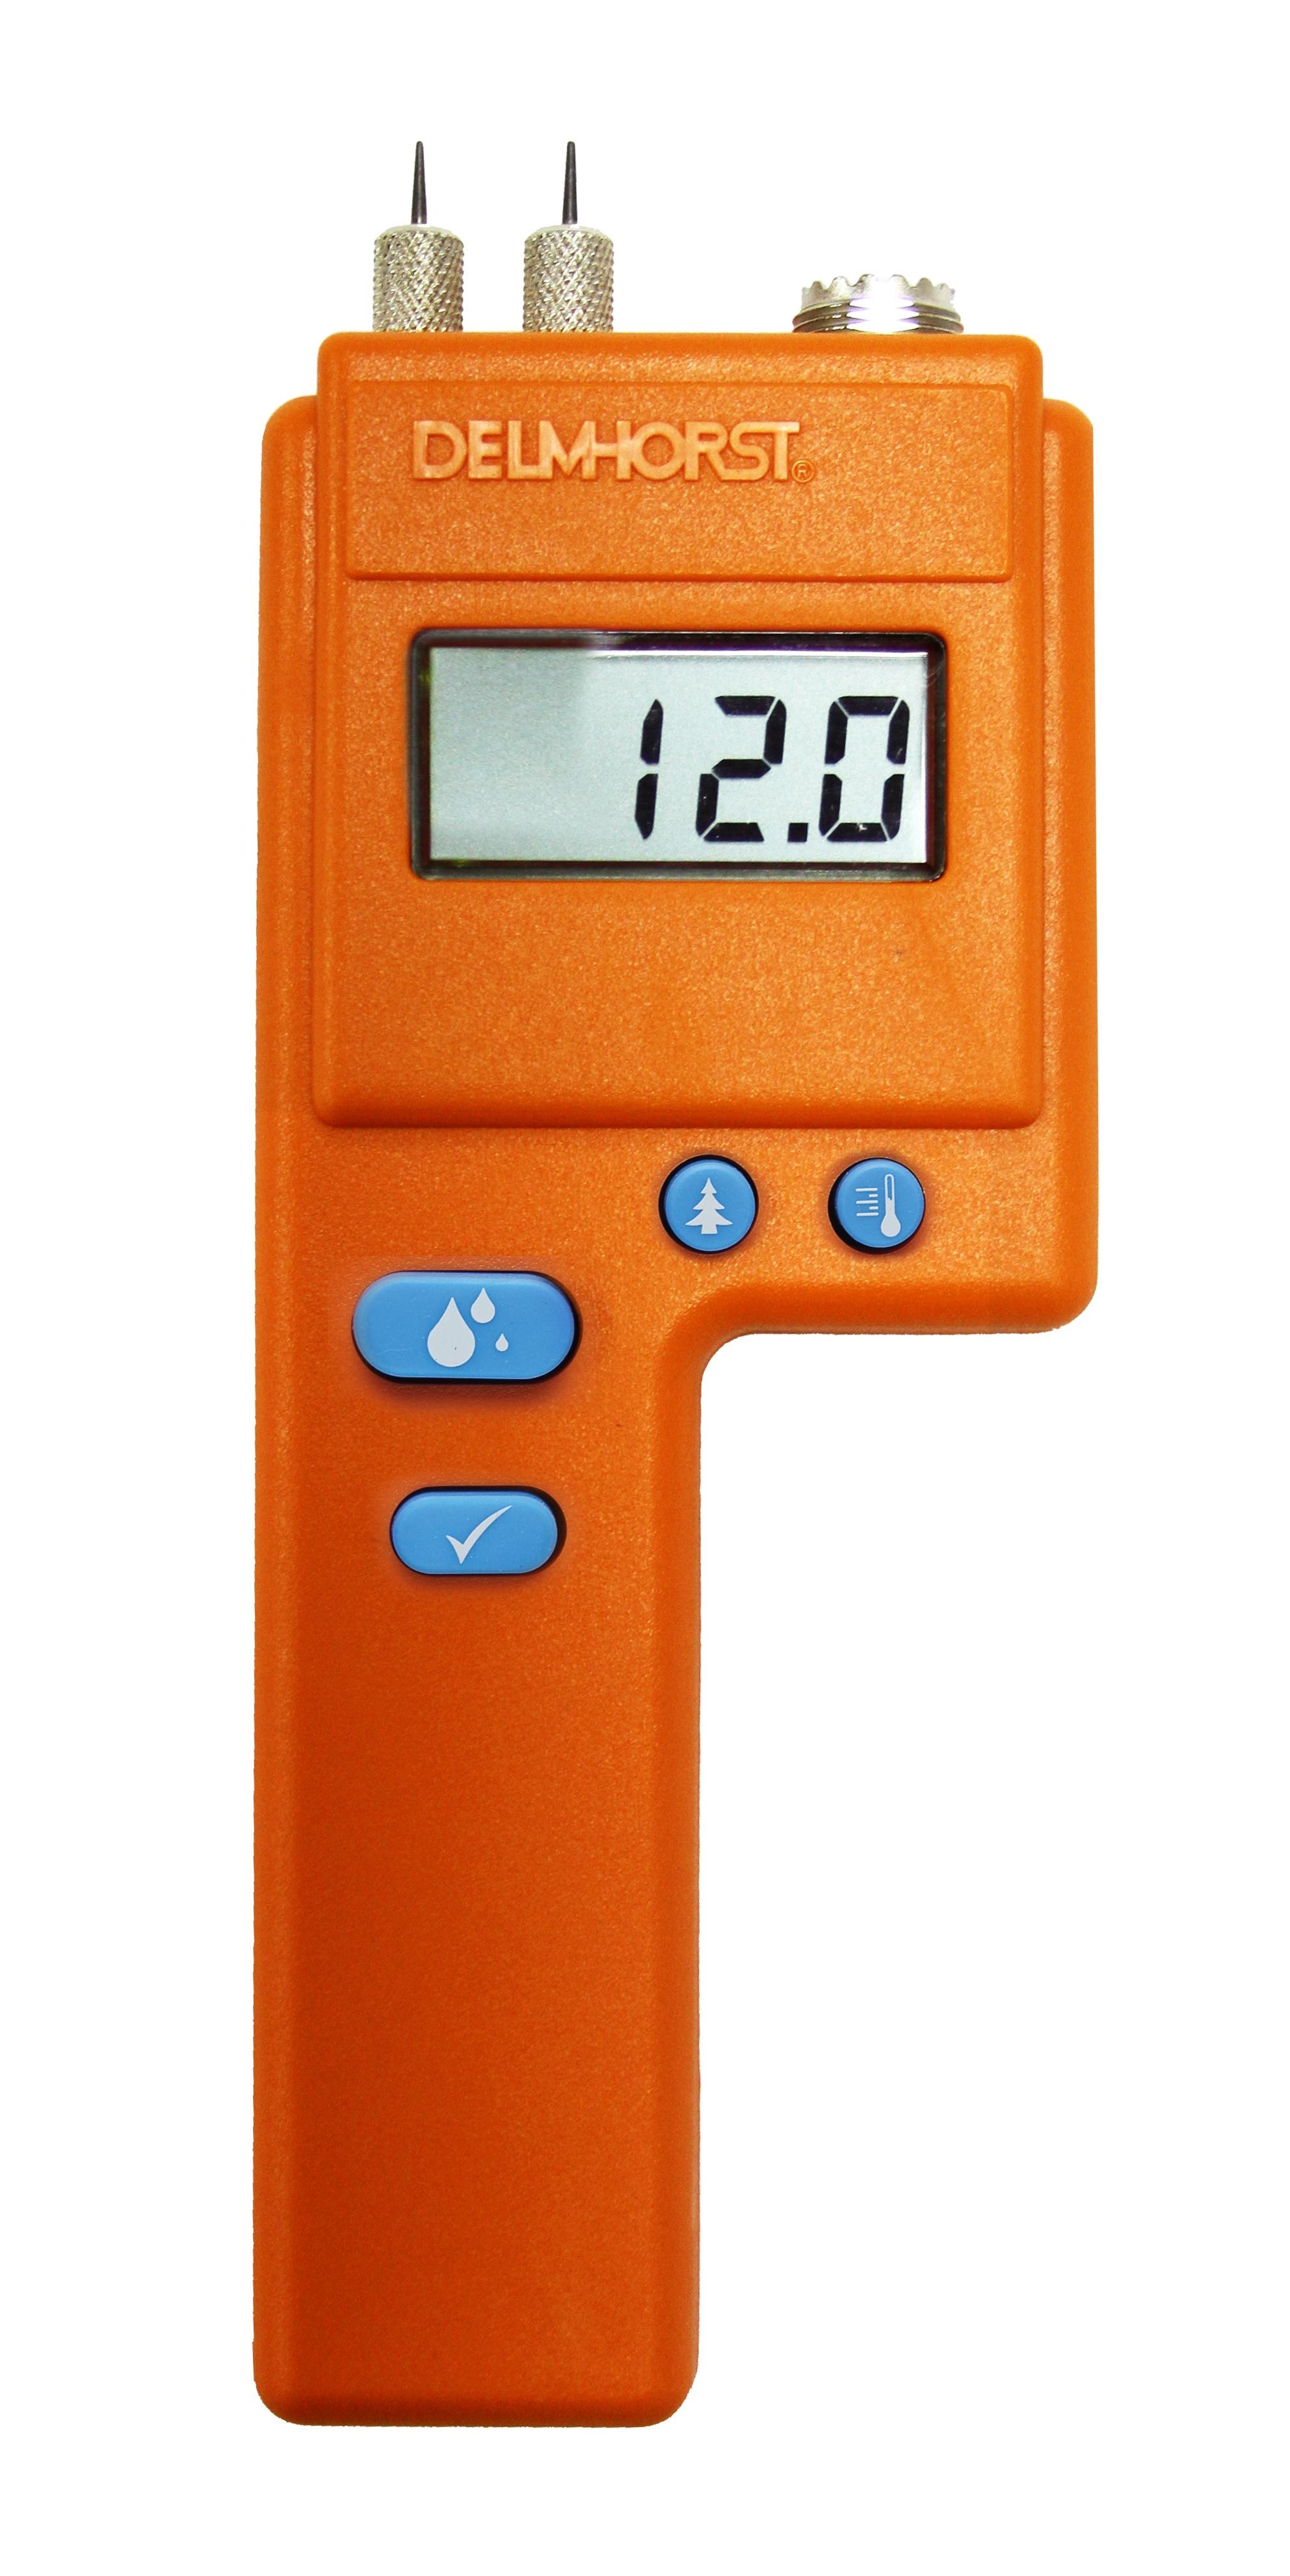 J-2000 moisture meter for woodworking